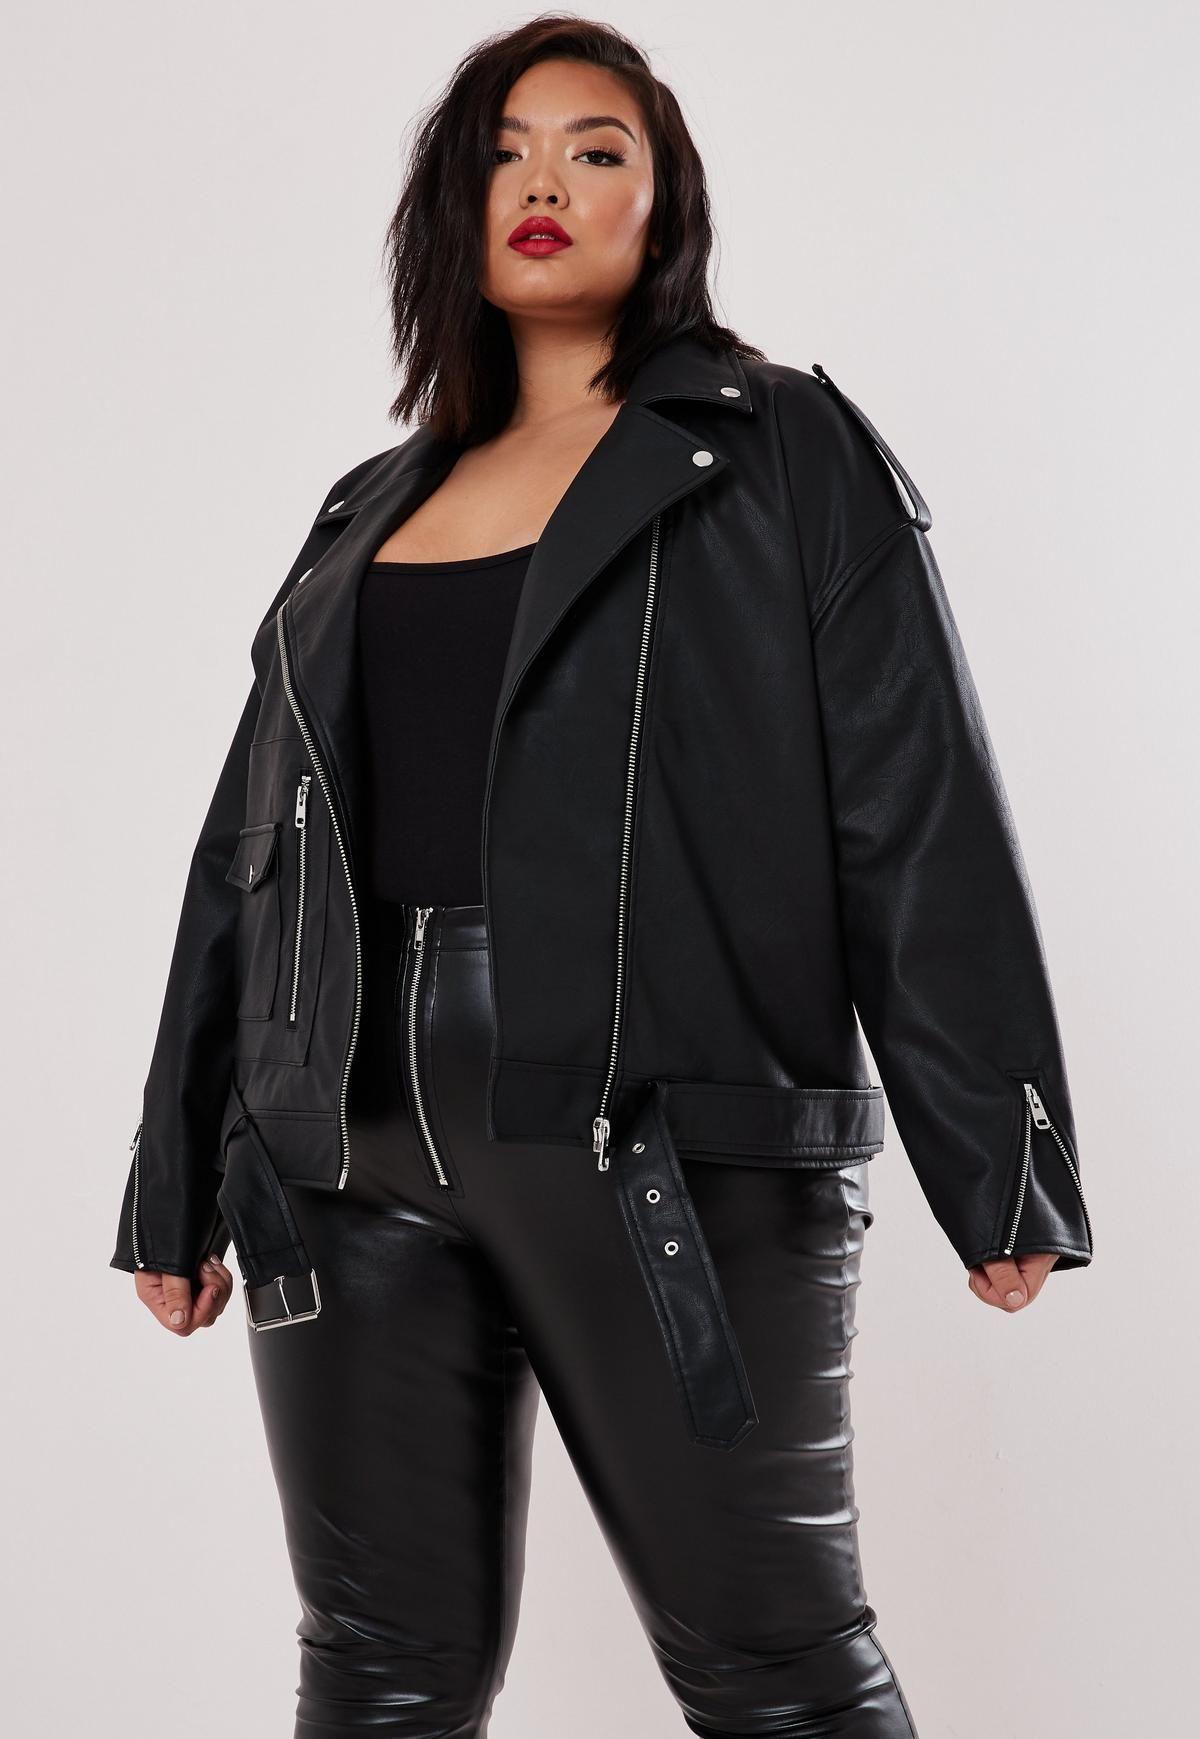 Womens Biker Jacket Plus Size Plus Size Leather Jacket Leather Jacket Plus Size Outfits [ 1739 x 1200 Pixel ]